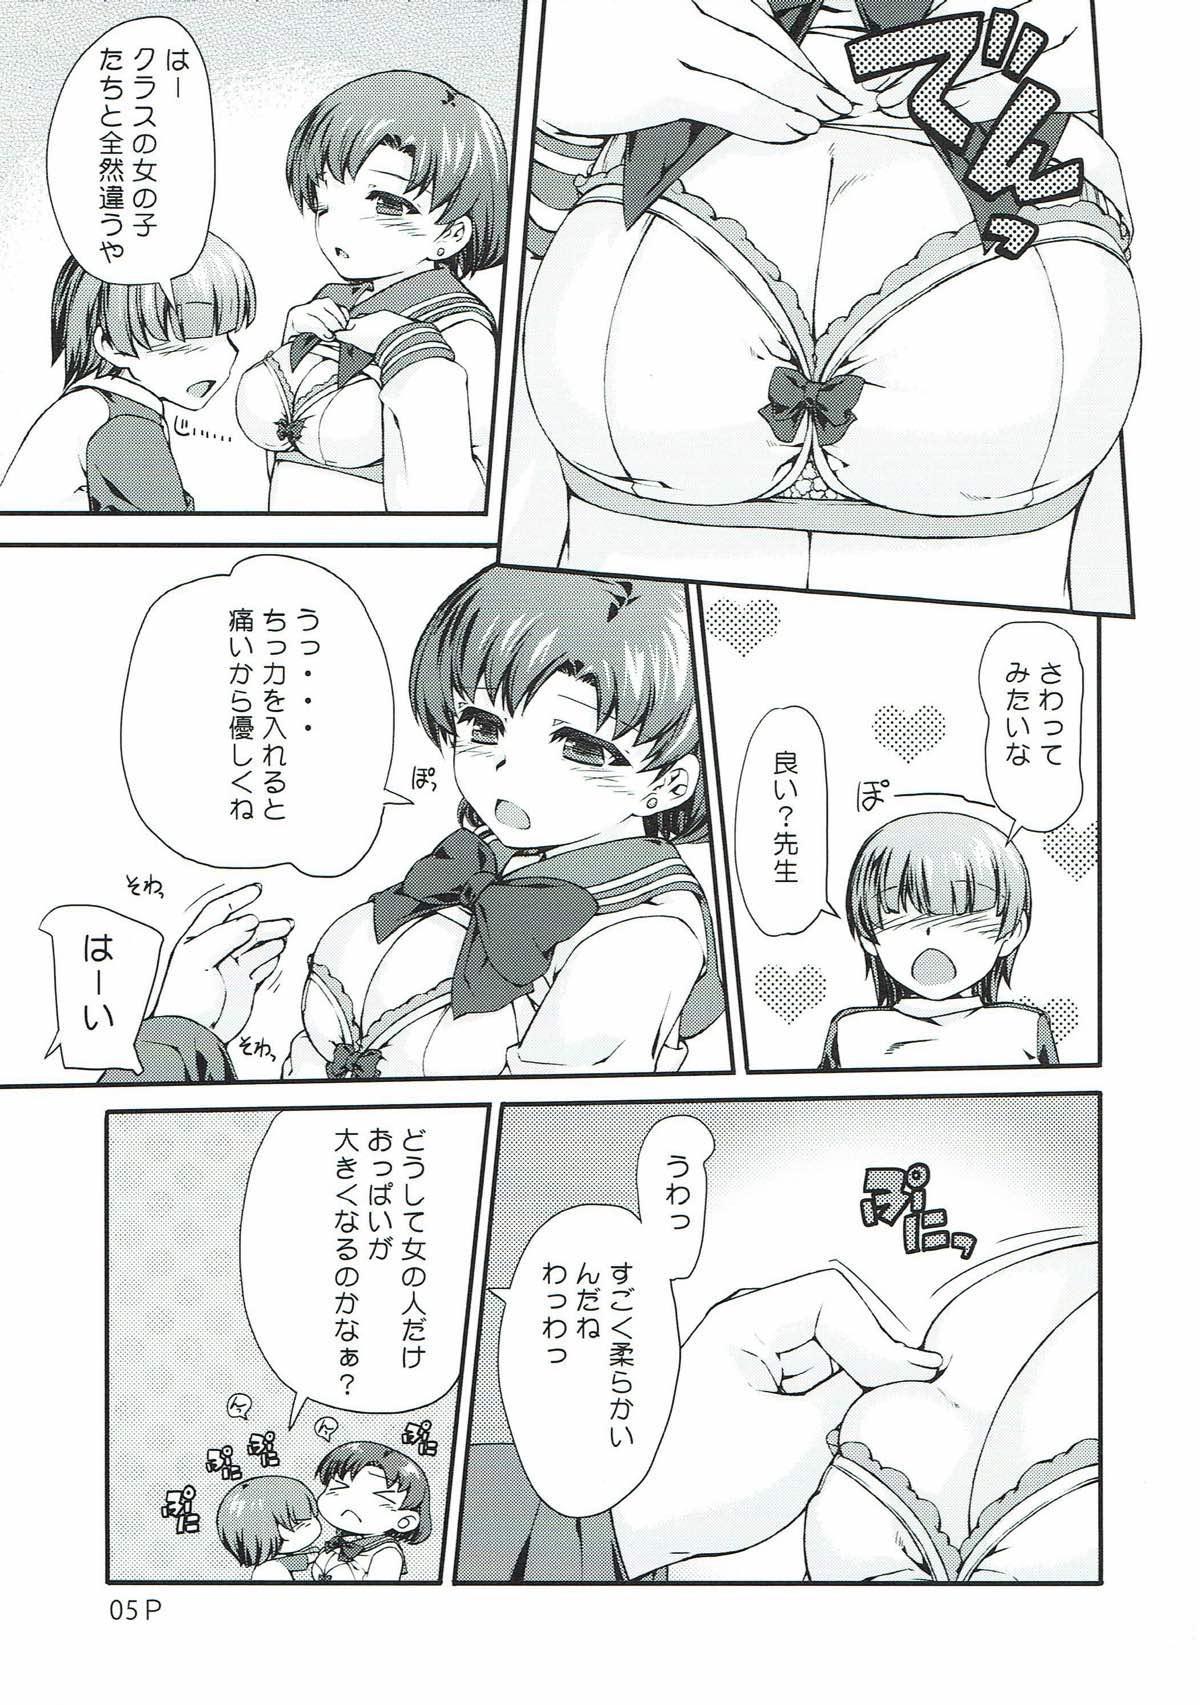 Suika 4